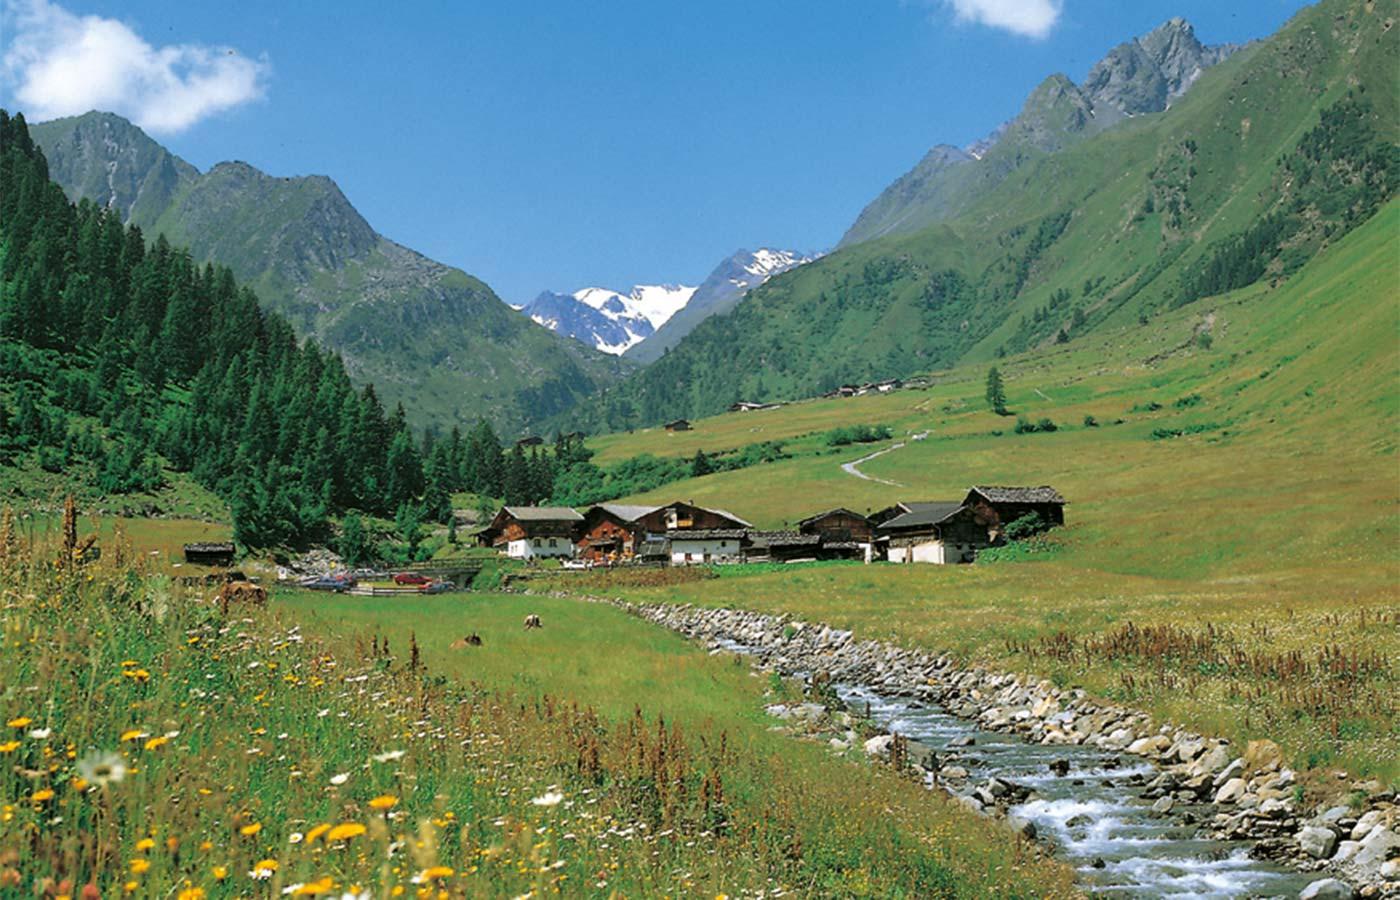 Oberiss Alm - das beliebte Ausflugsziel im Stubaital Urlaub Hotel Almhof